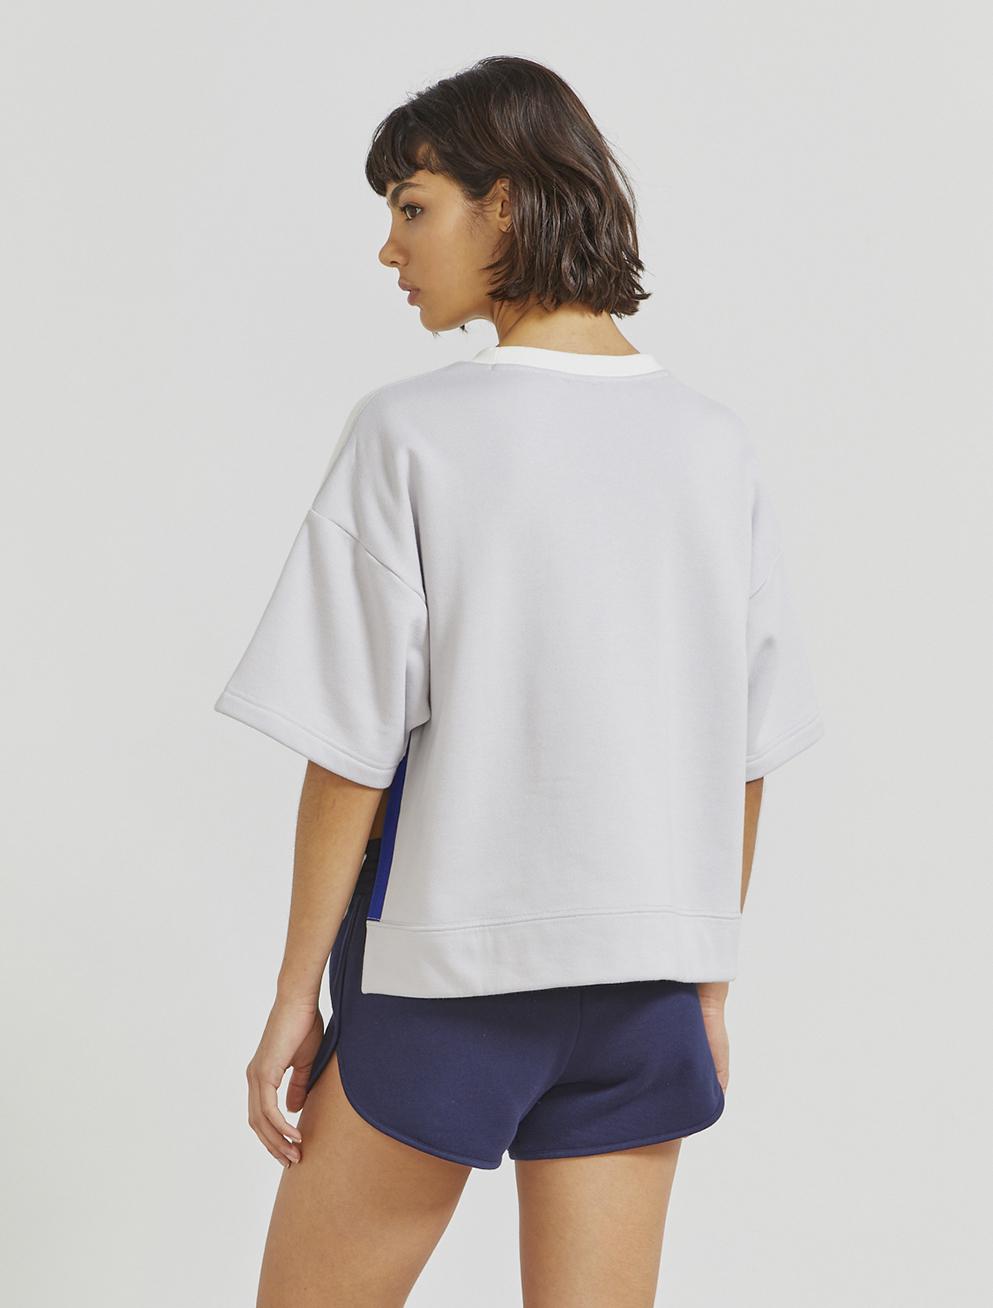 Organic cotton short-sleeve sweatshirt